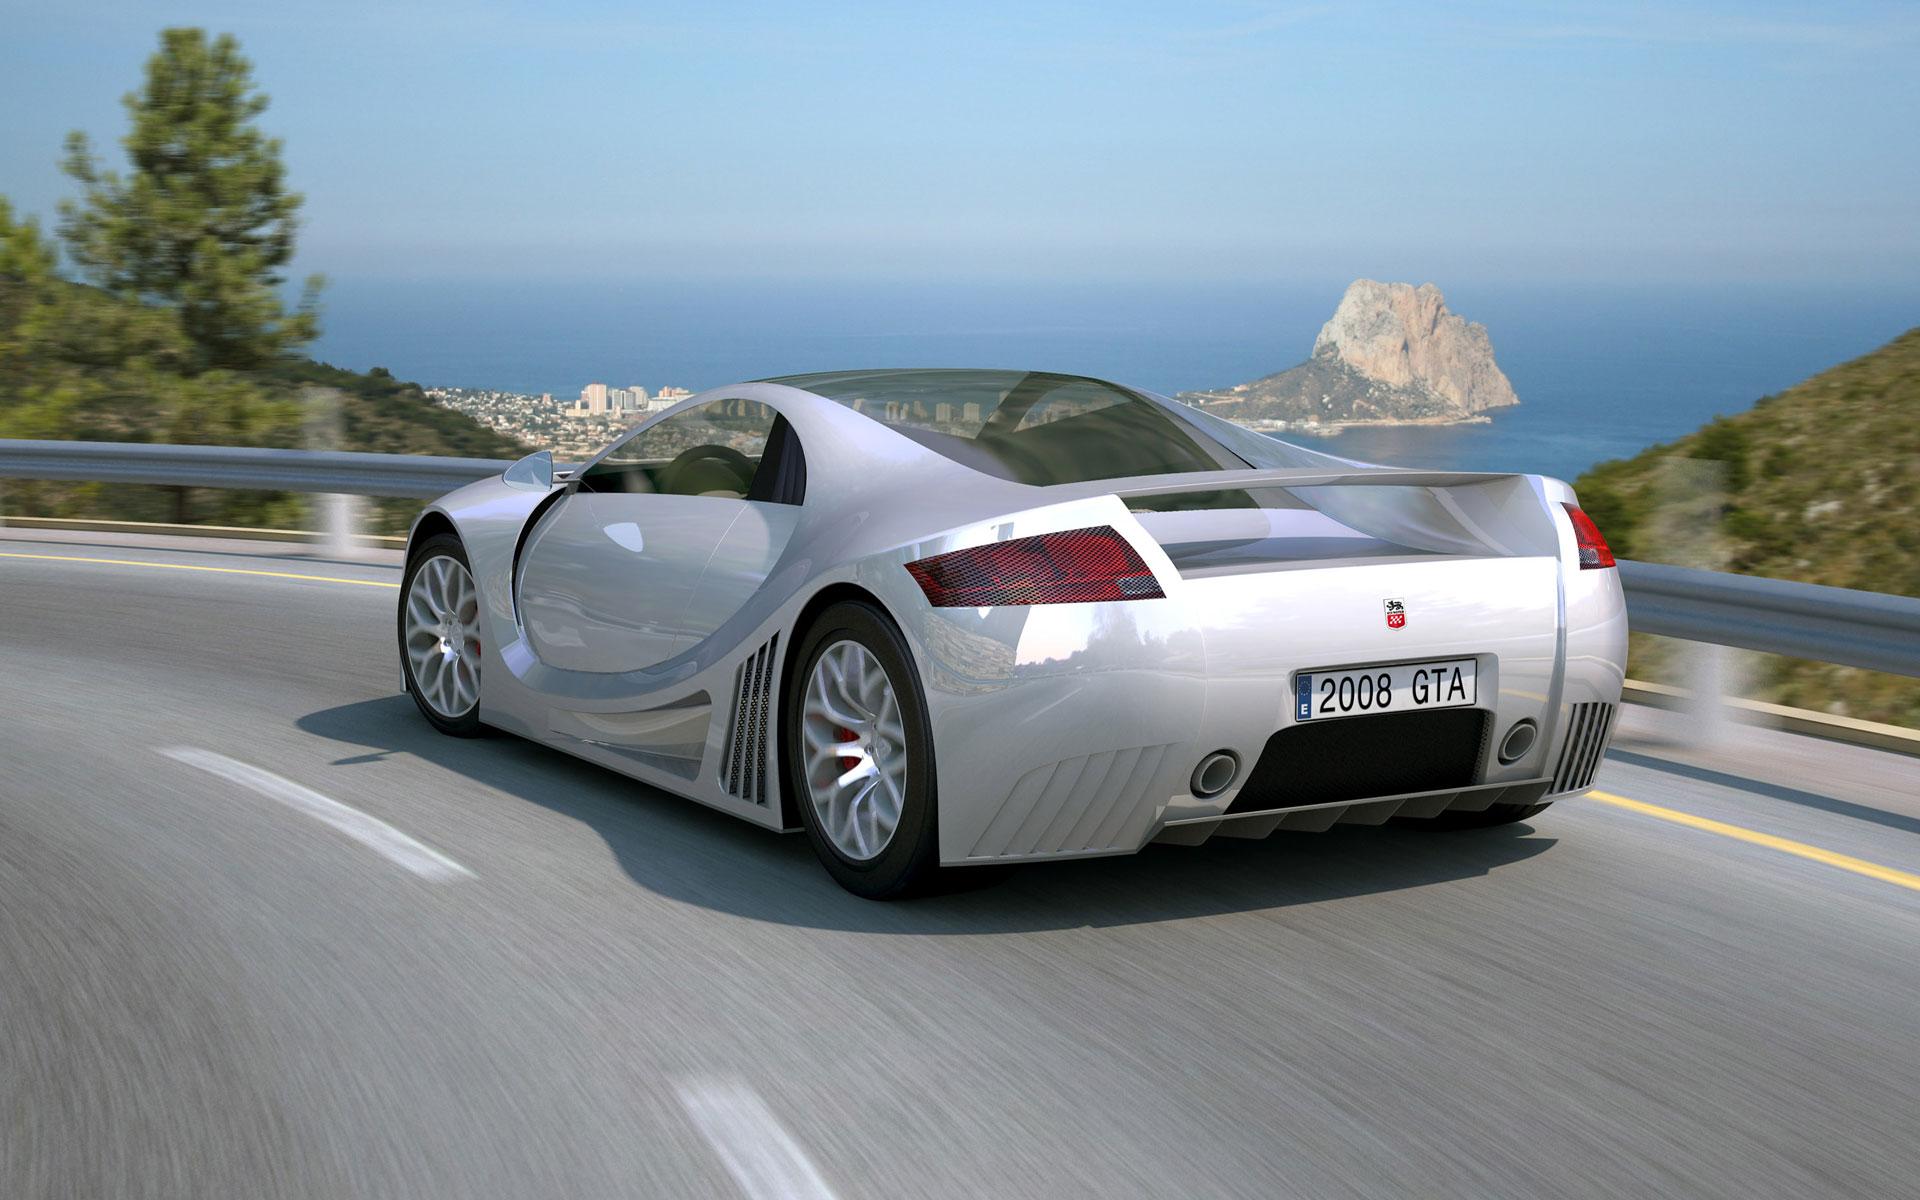 Tags: Super Concept Sport